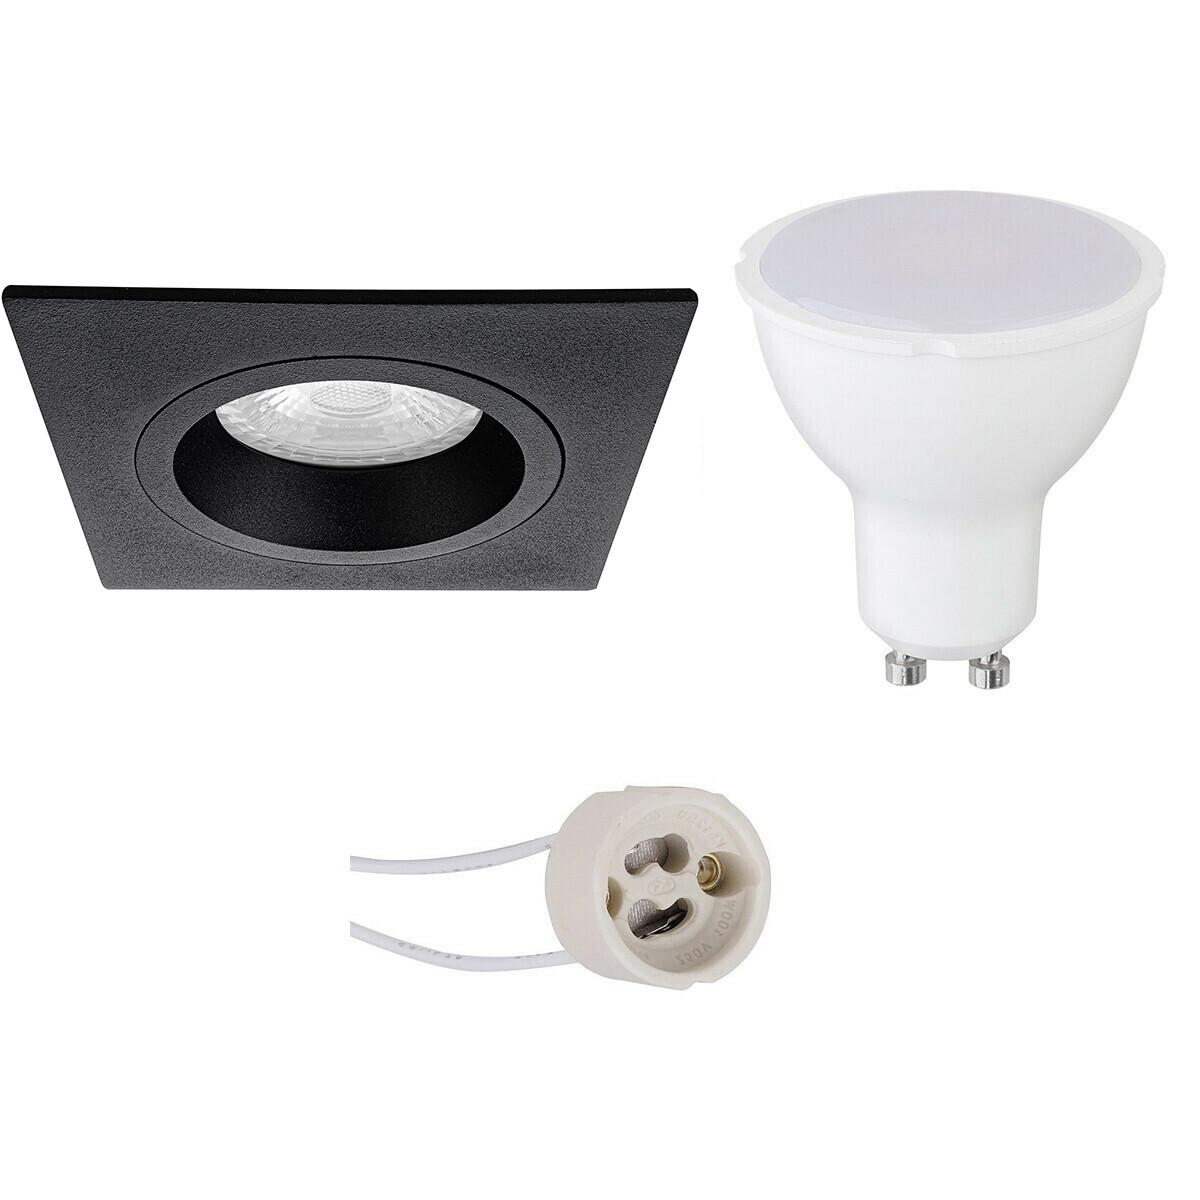 LED Spot Set - Aigi - Pragmi Rodos Pro - GU10 Fitting - Inbouw Vierkant - Mat Zwart - 8W - Warm Wit